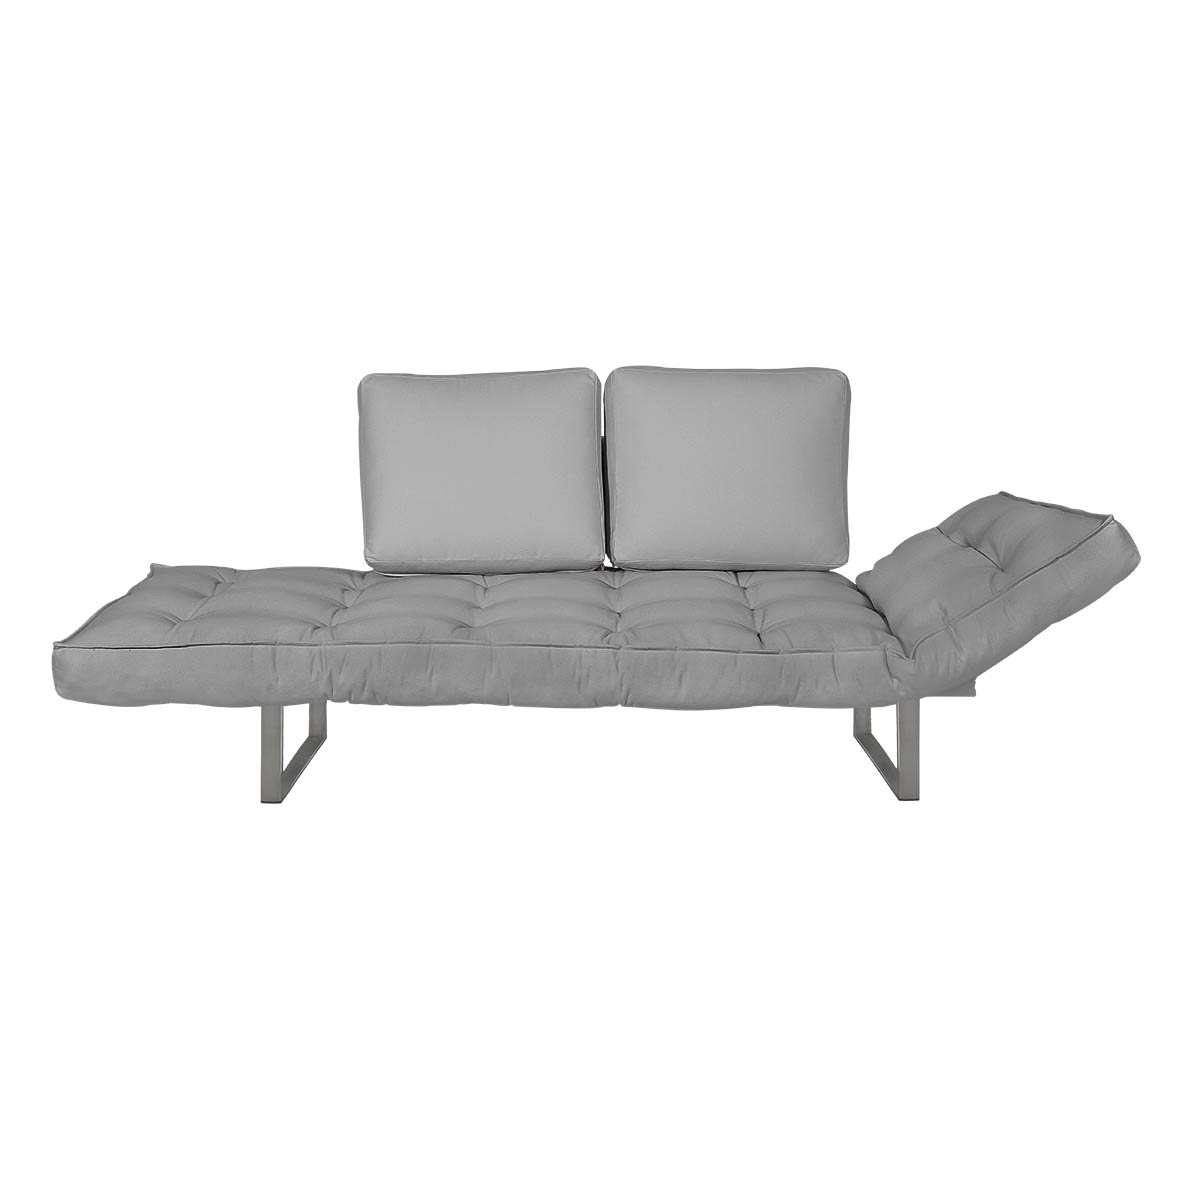 Sofa Cama Solteiro • Futon Company - photo#15